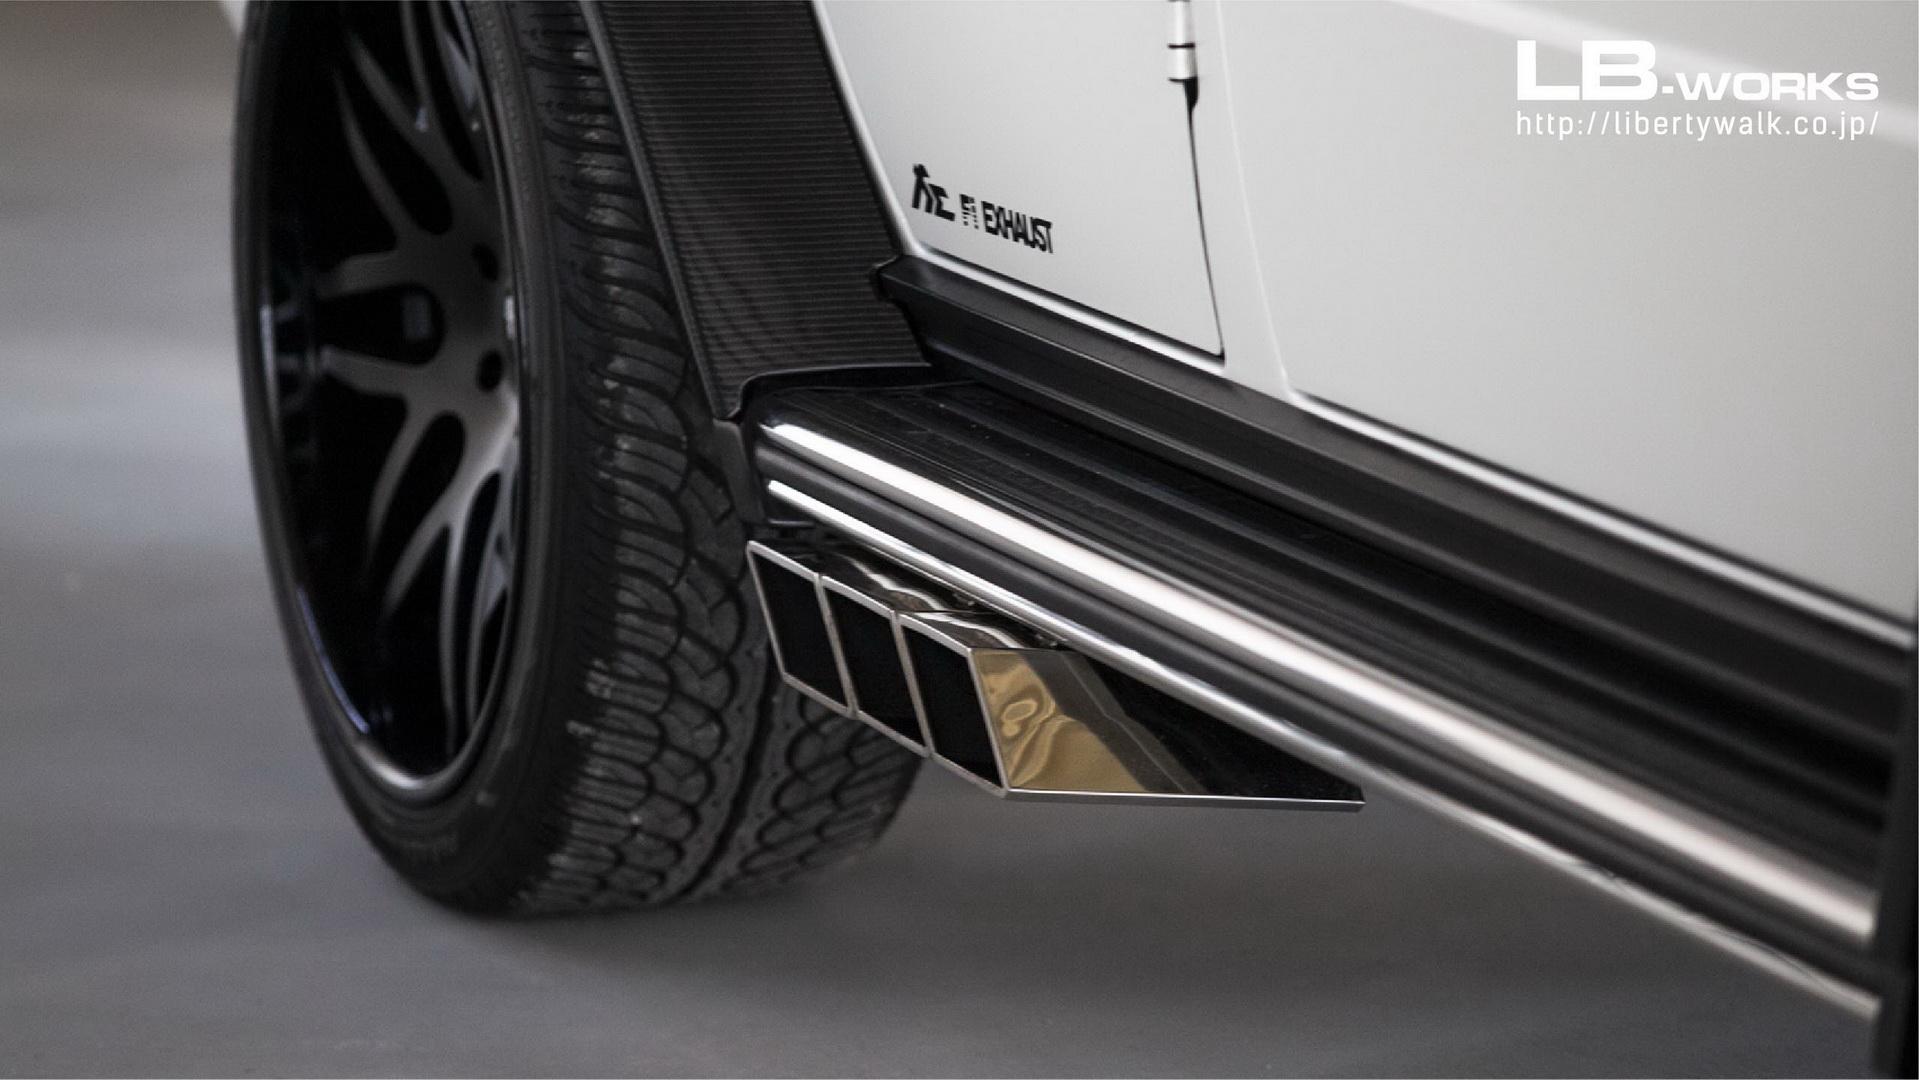 Mercedes G 63 AMG Liberty Walk